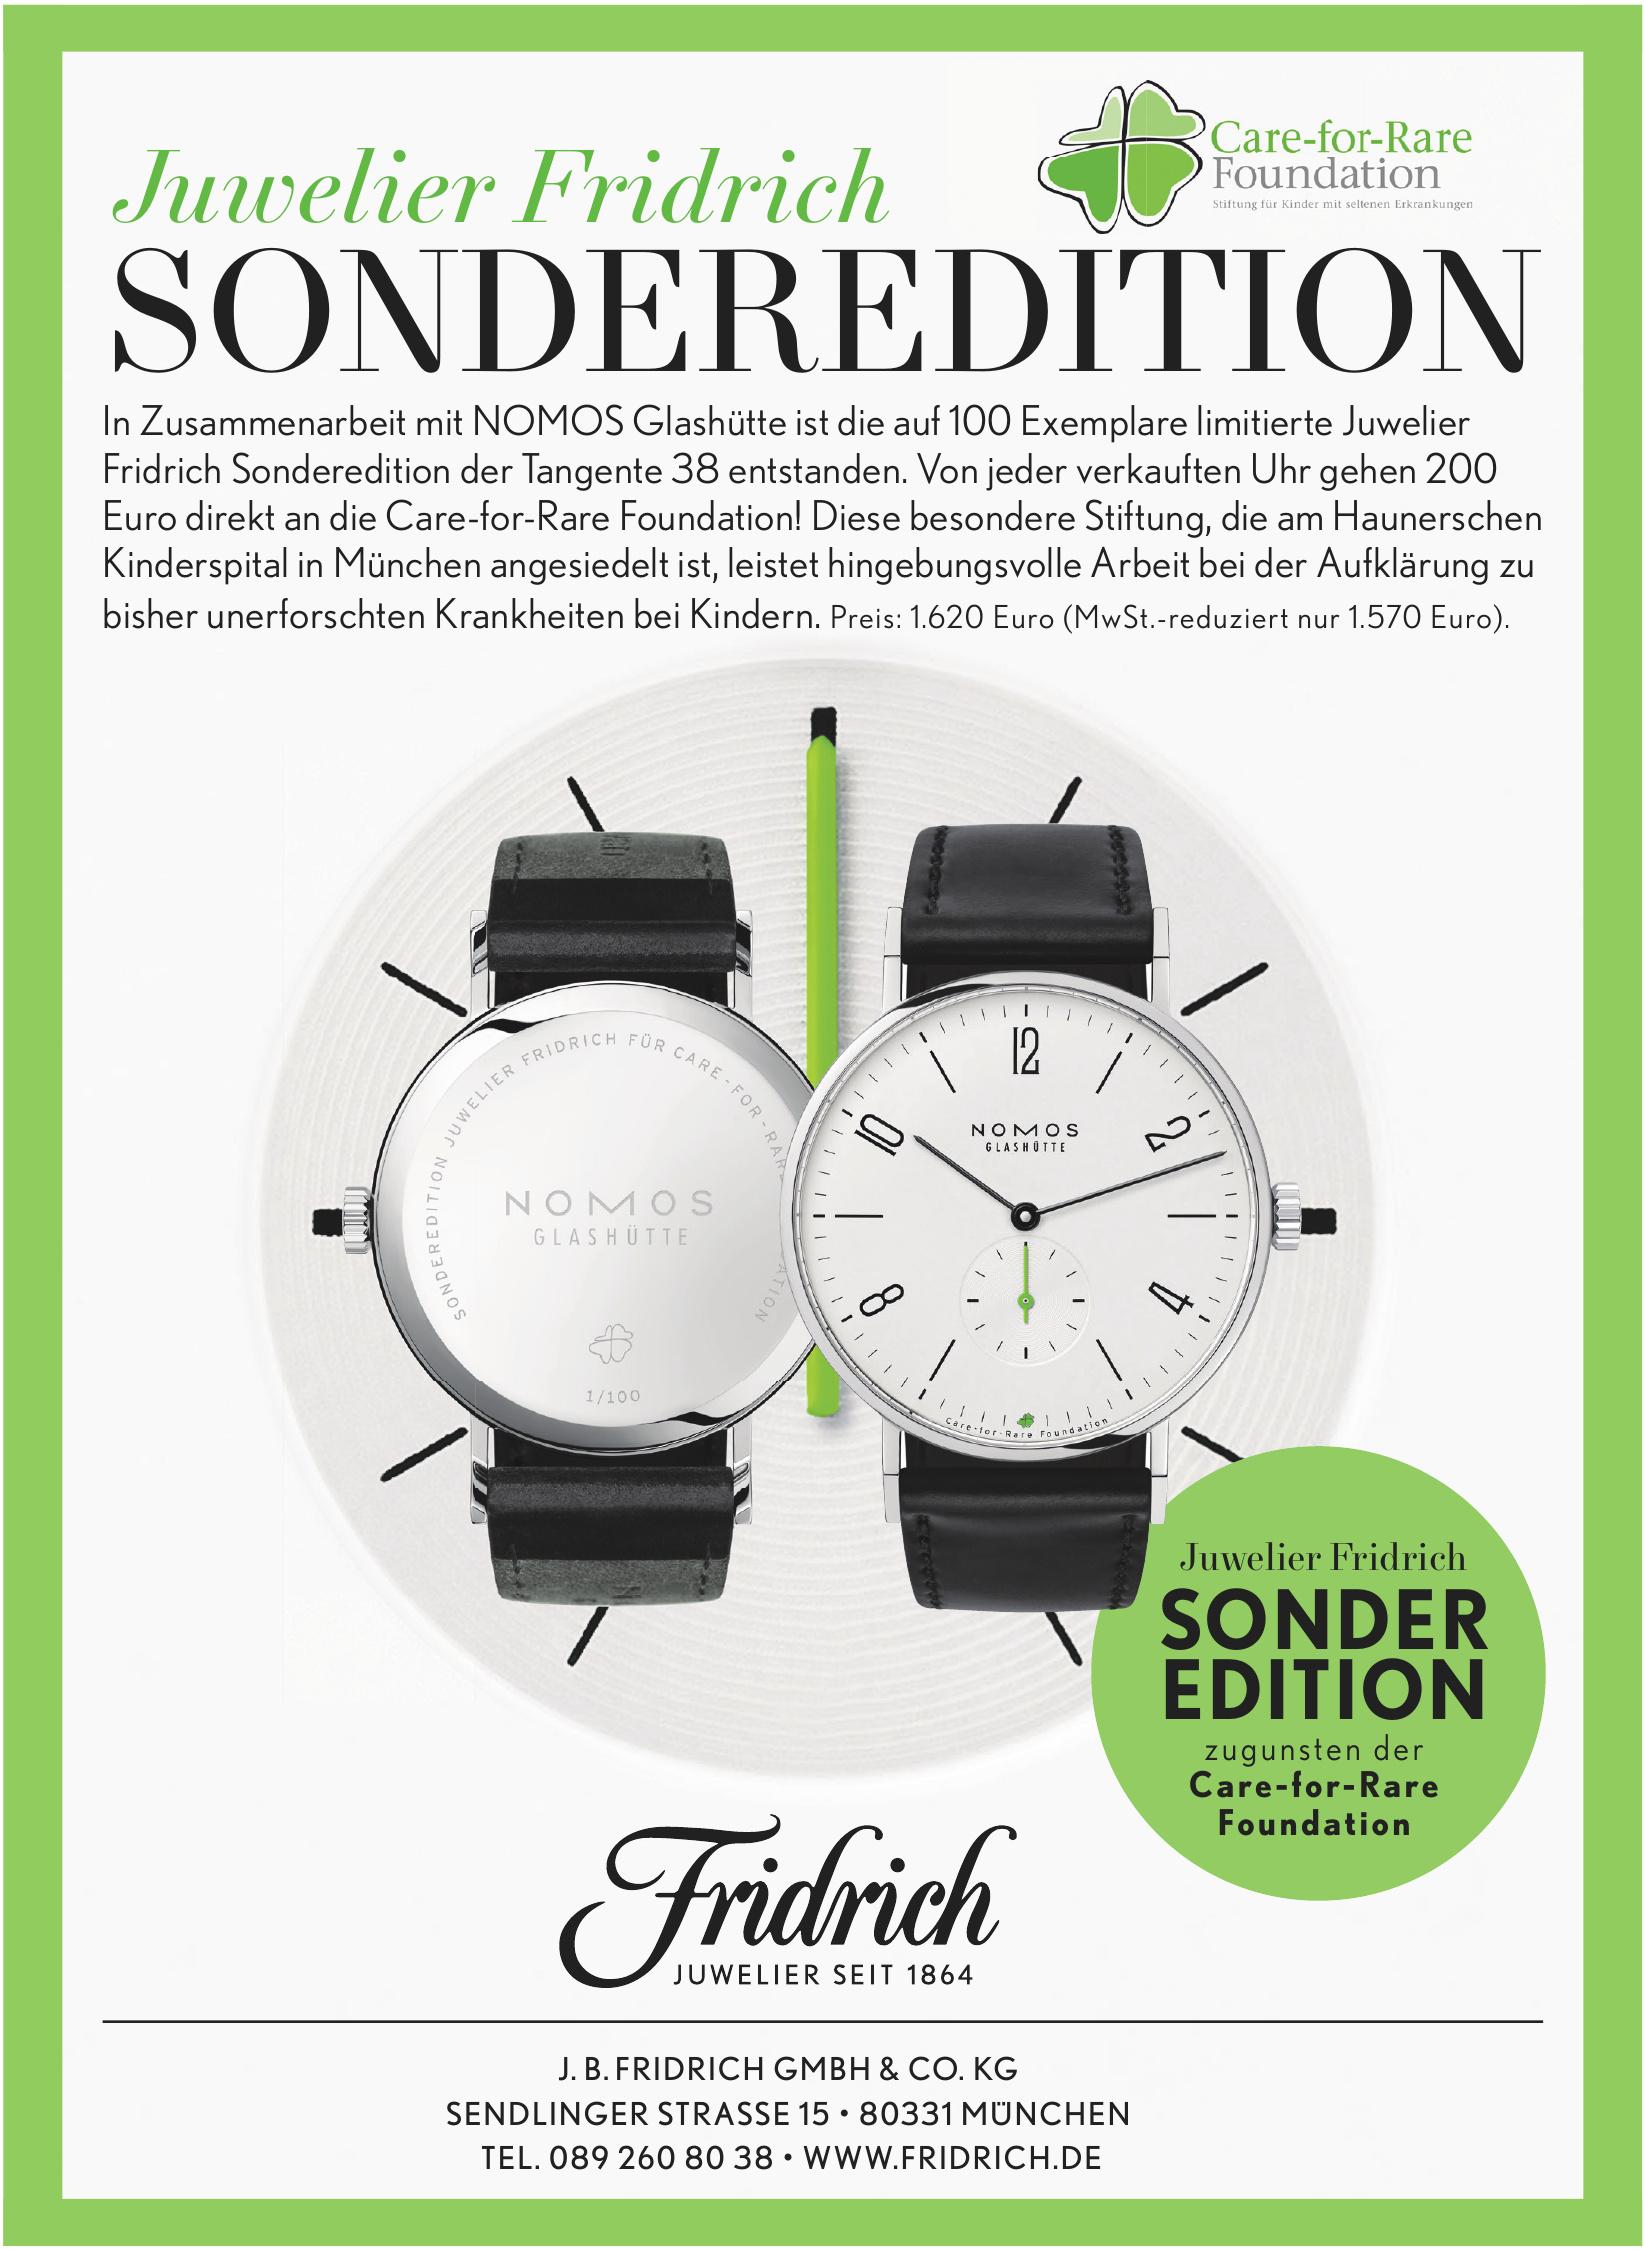 J.B. Fridrich GmbH & Co. KG